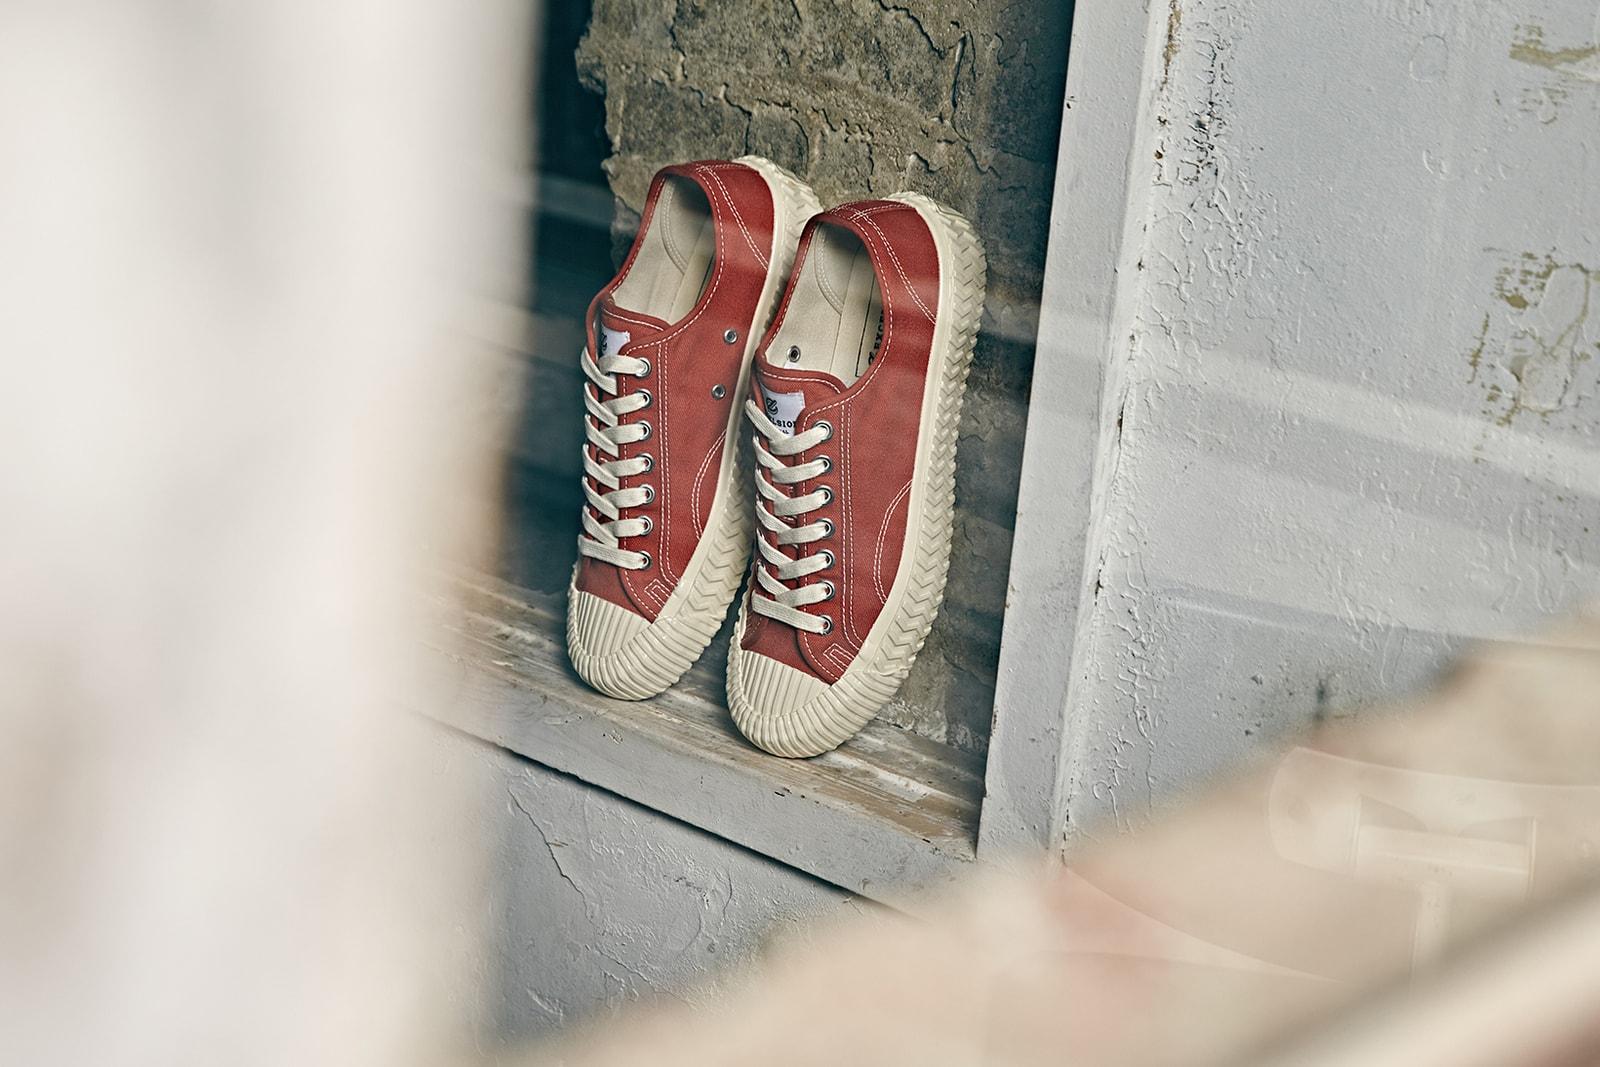 EXCELSIOR Industrial Classic Sneakers Korean Footwear Brand Mens Women's Unisex Where to Buy